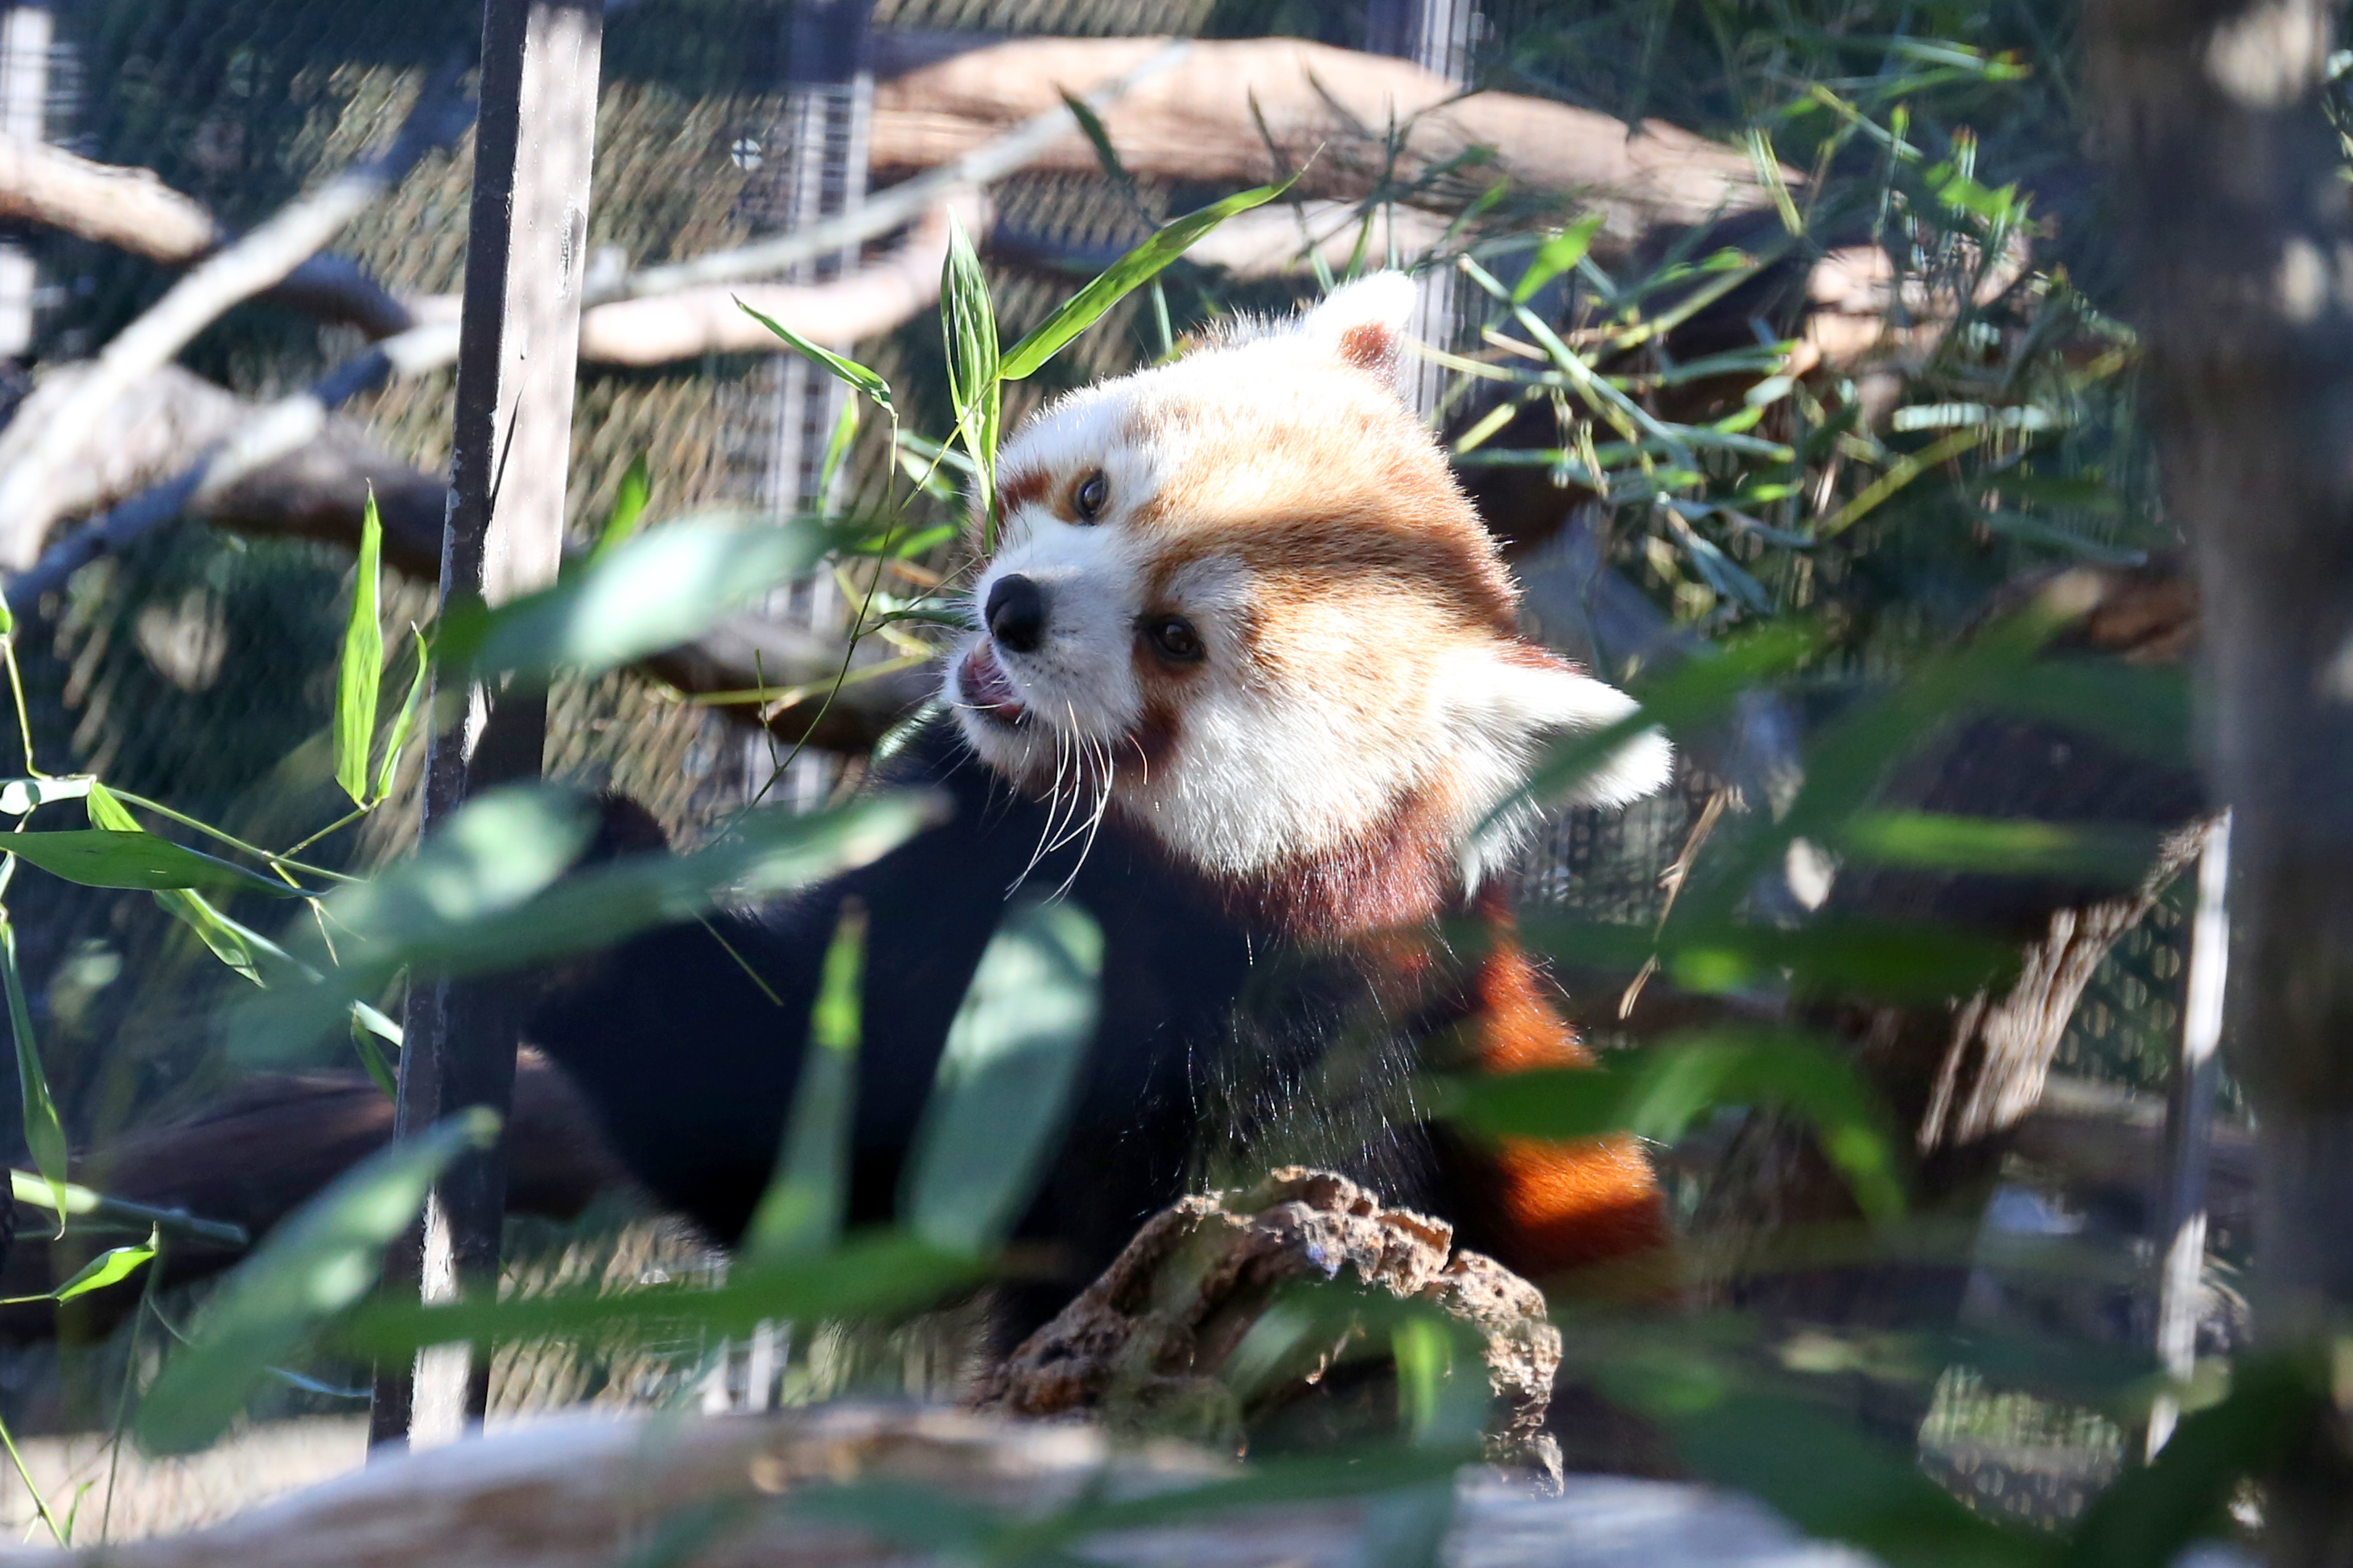 Red panda habitat reopens at National Zoo next week